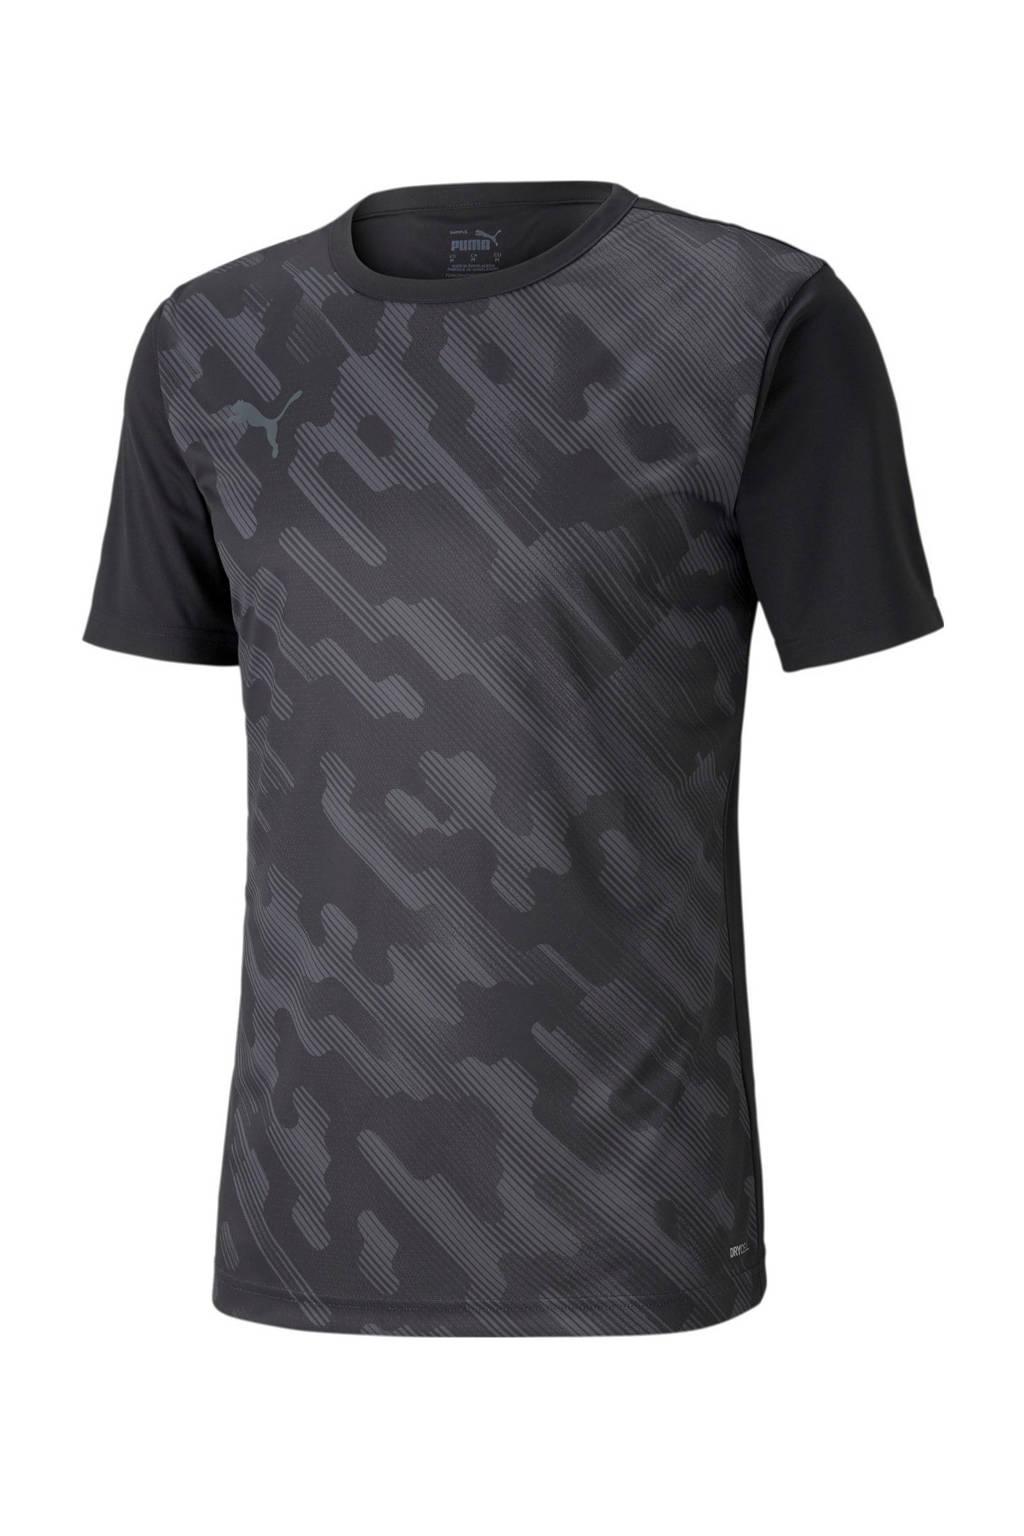 Puma Senior  sport T-shirt zwart/donkergrijs, Zwart/donkergrijs